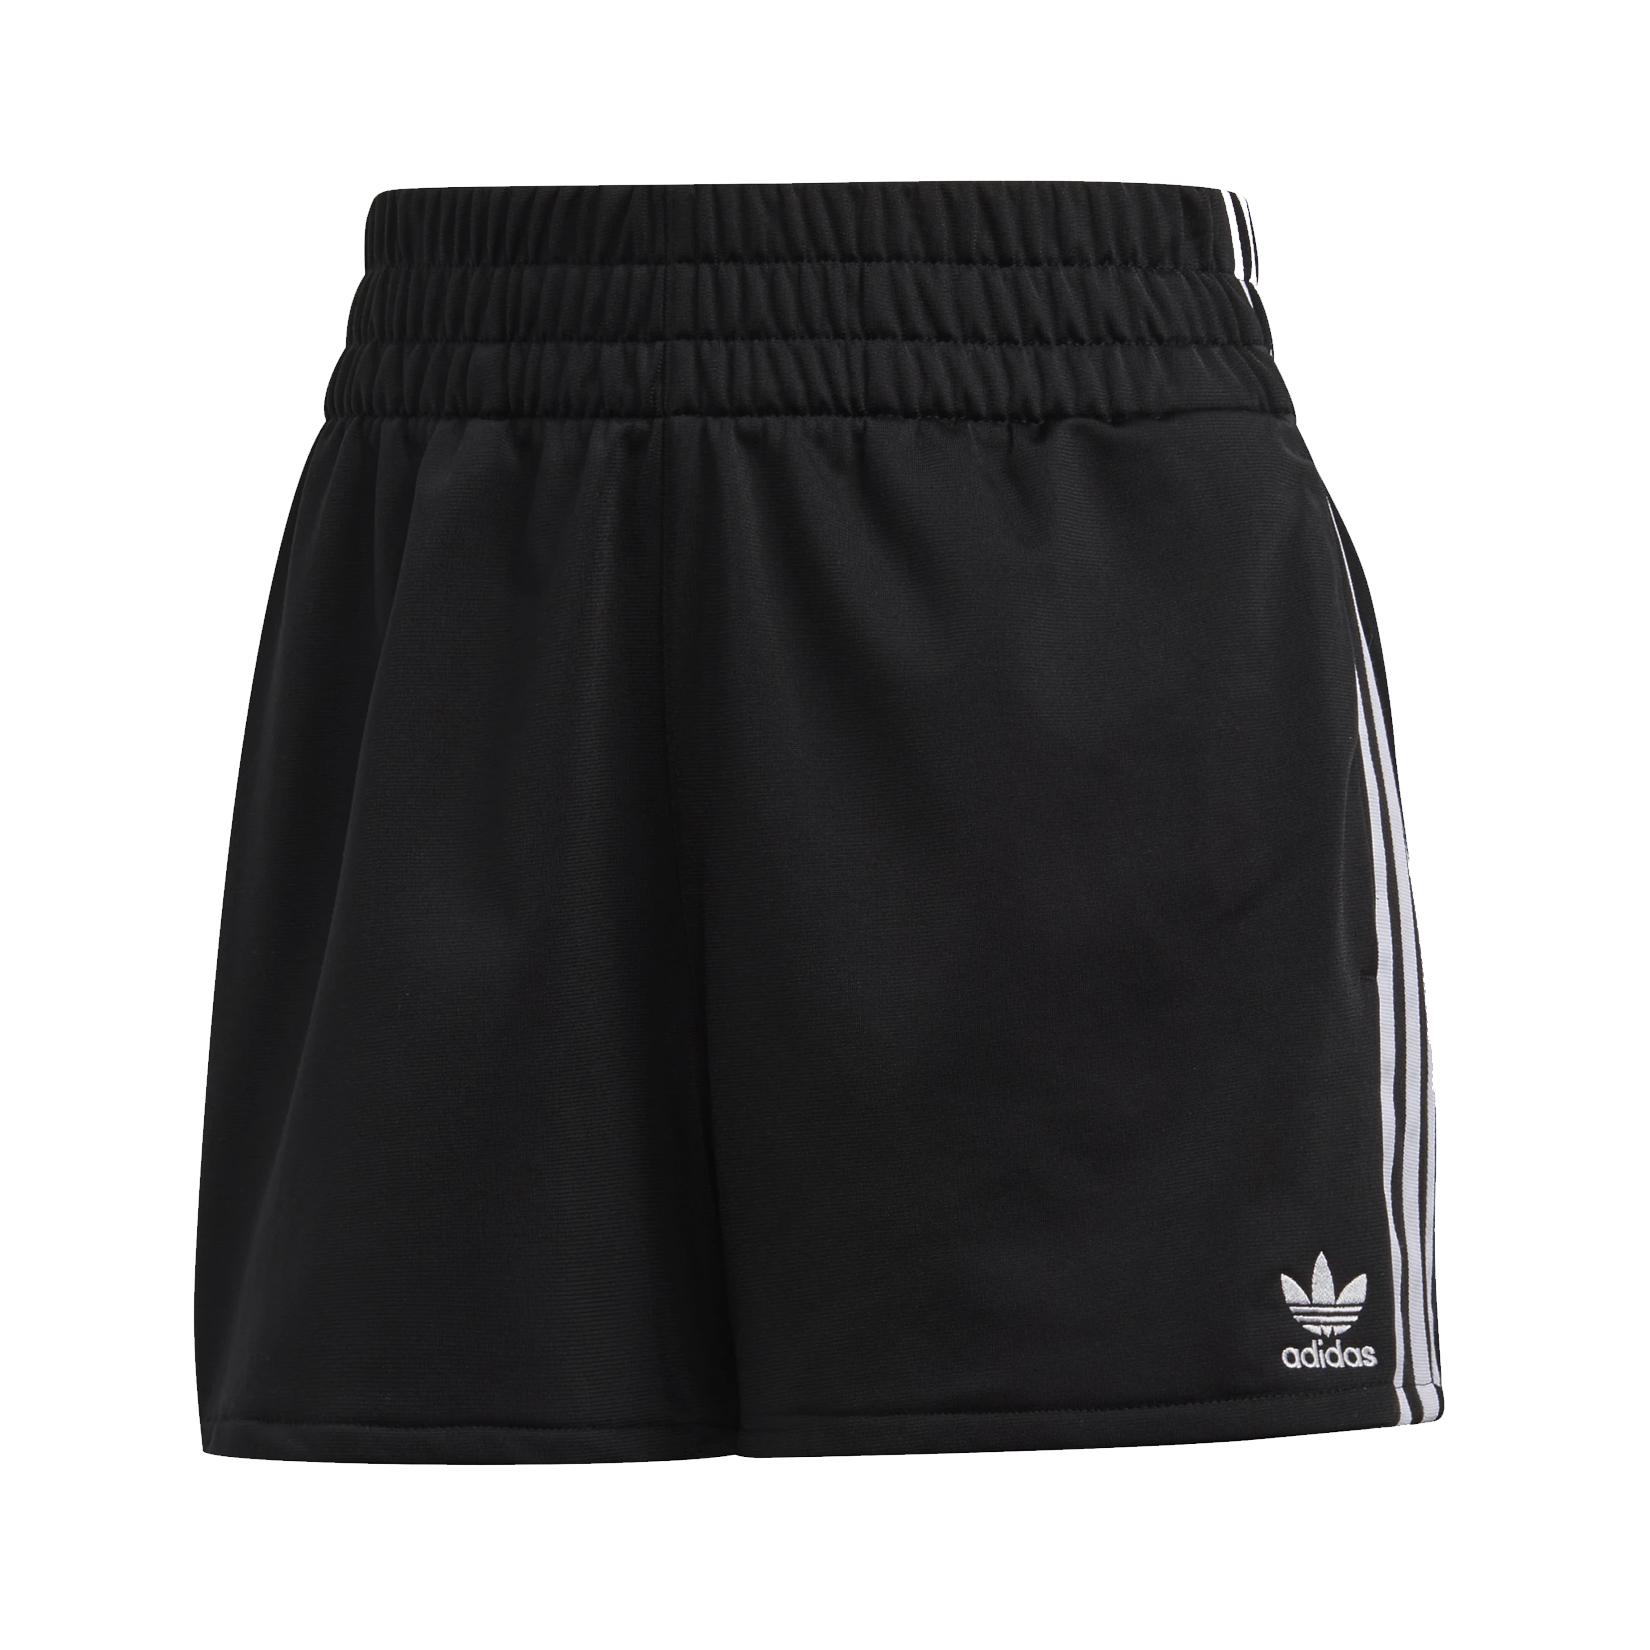 Adidas Originals 3-Stripes Shorts Black